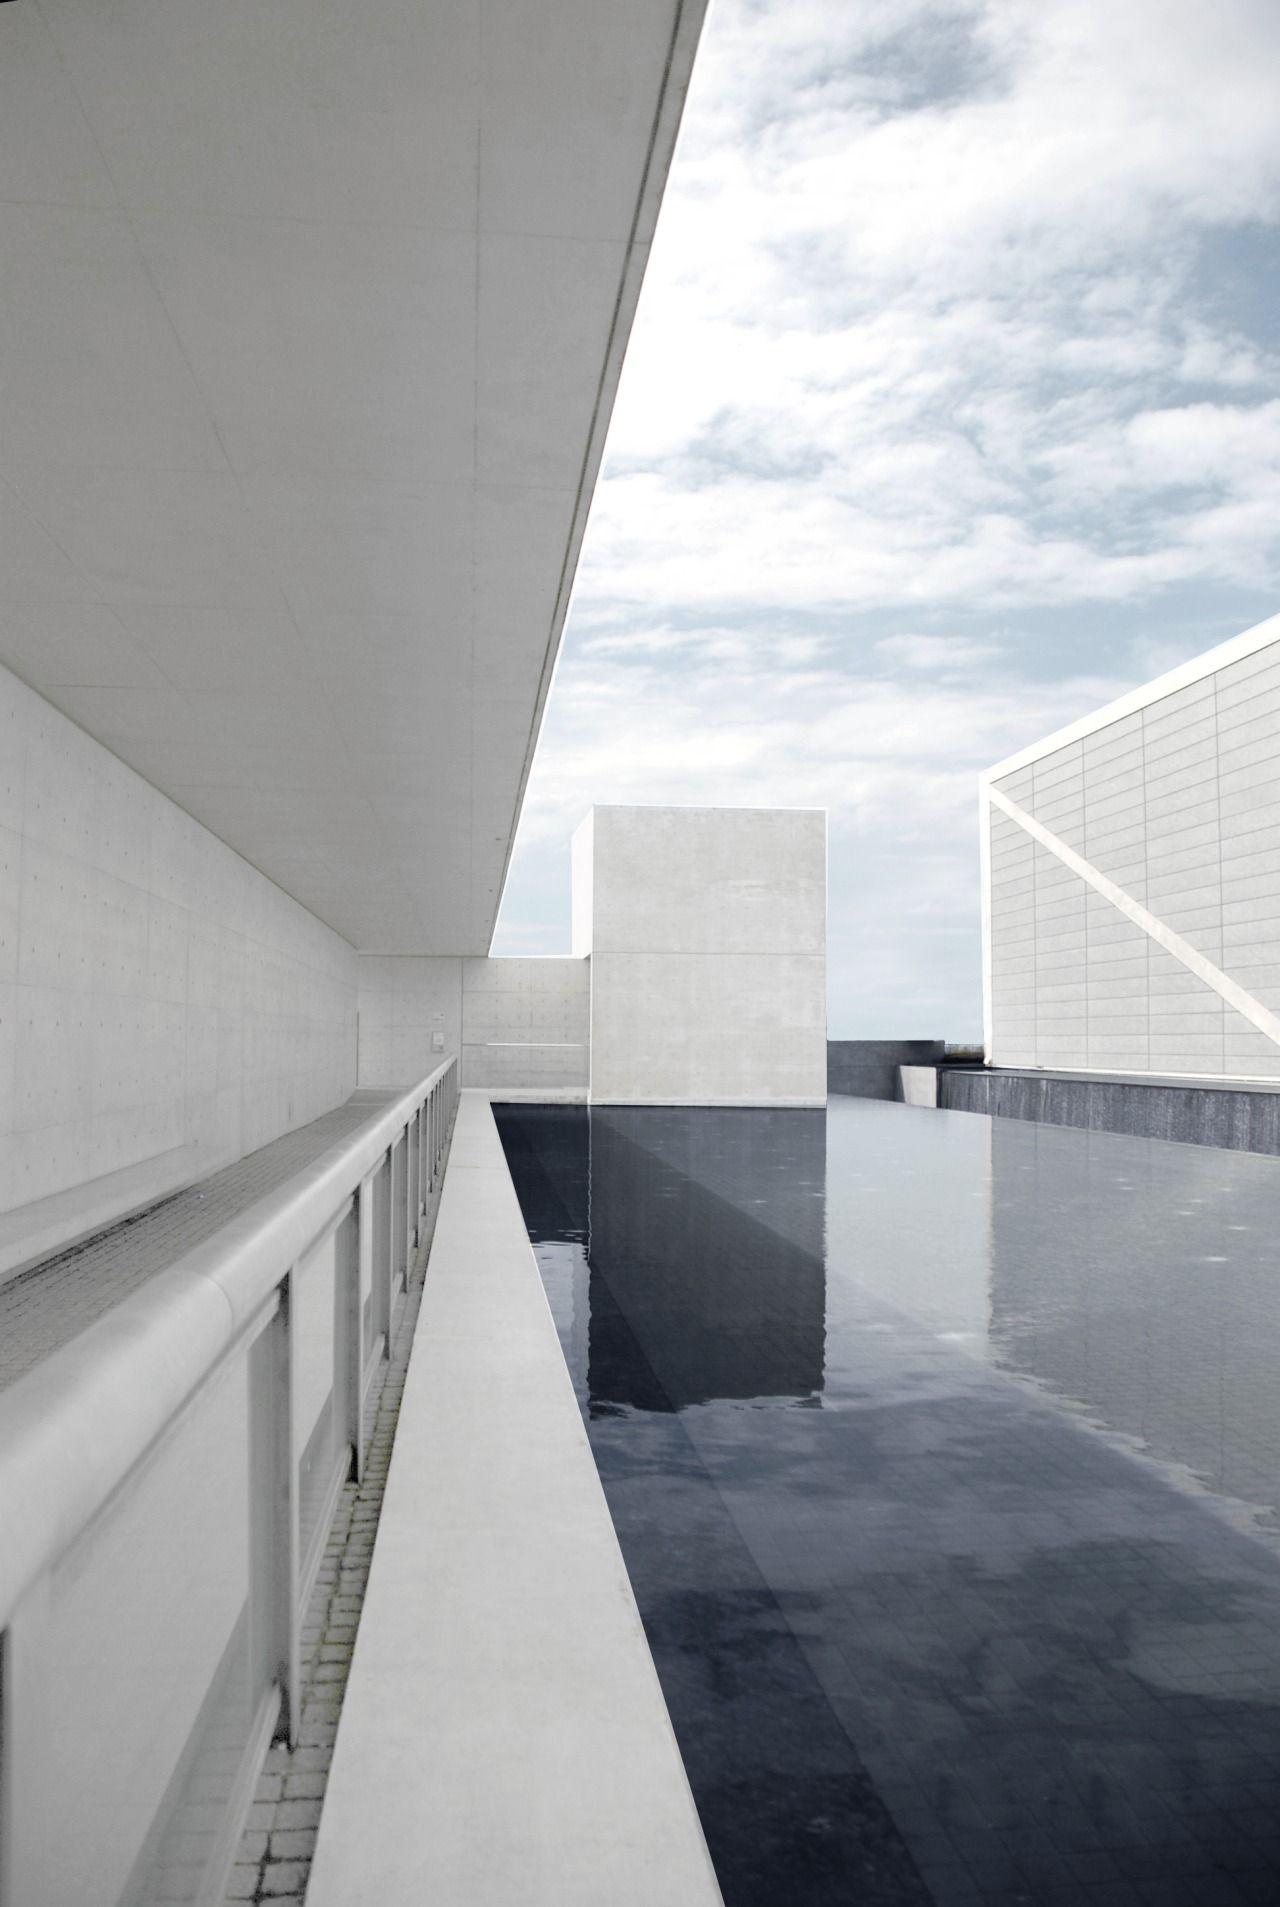 Tadao Ando - Pinned Architecture